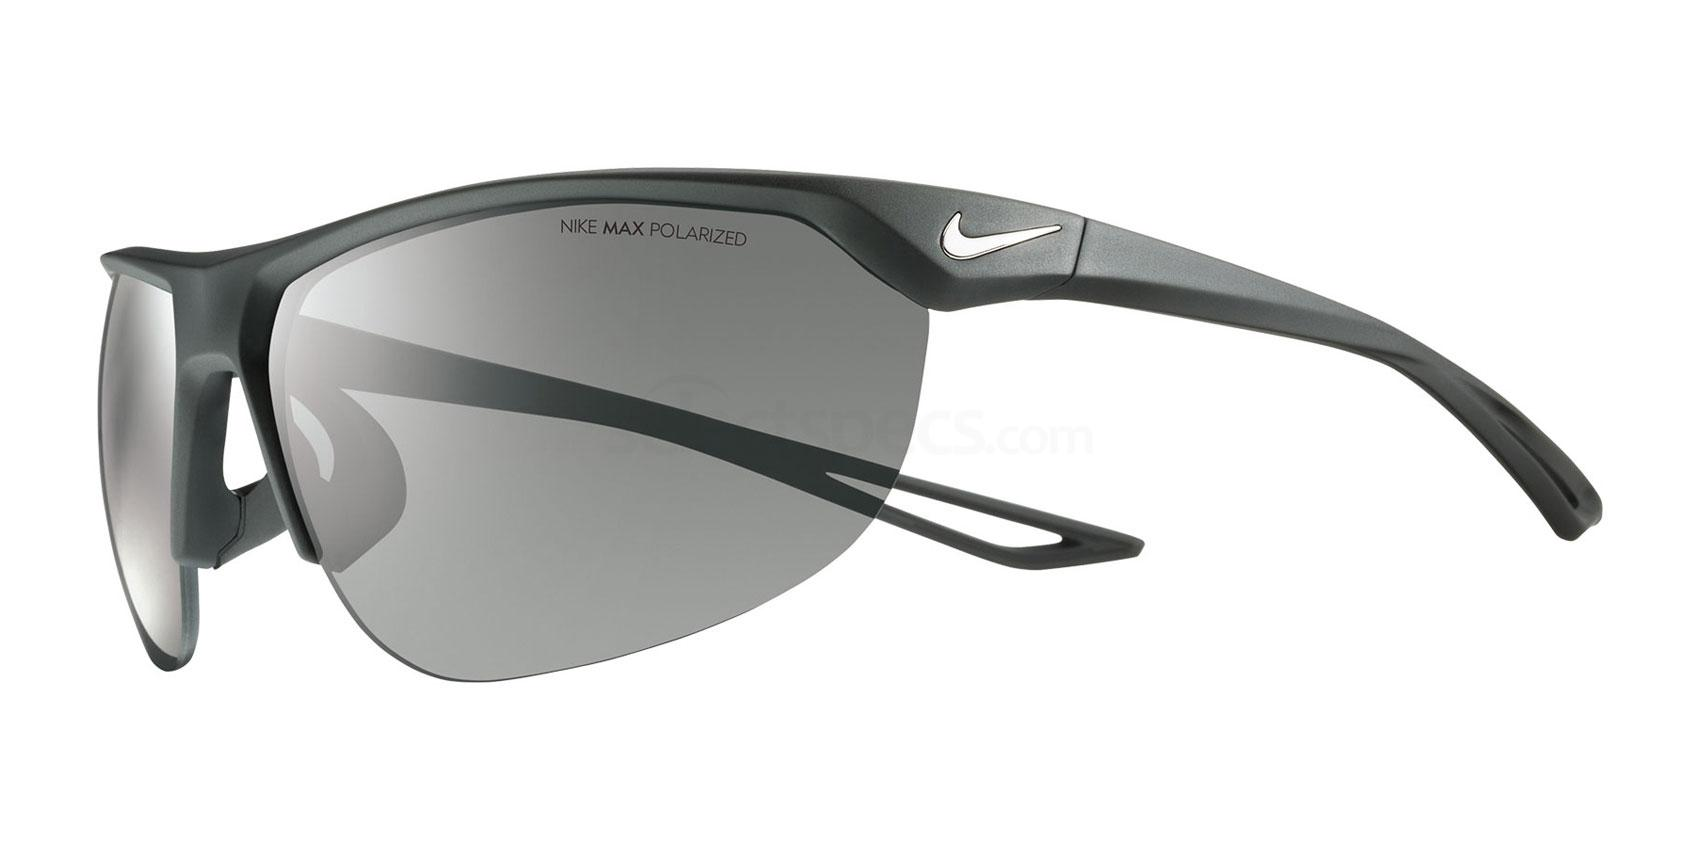 001 CROSS TRAINER P EV0939 Sunglasses, Nike